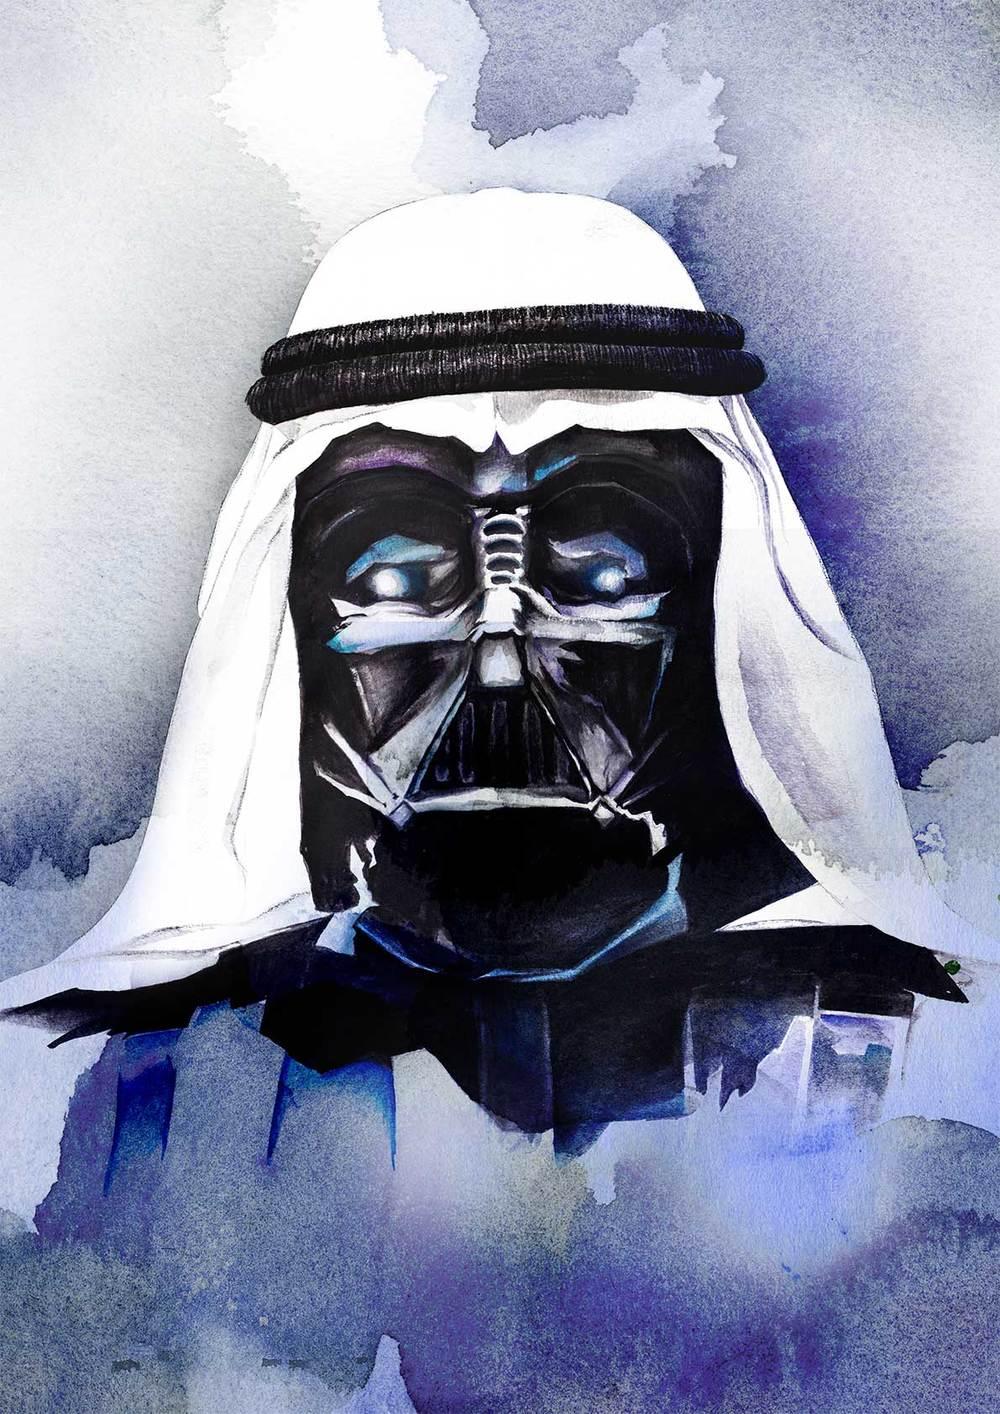 sheikh_vader